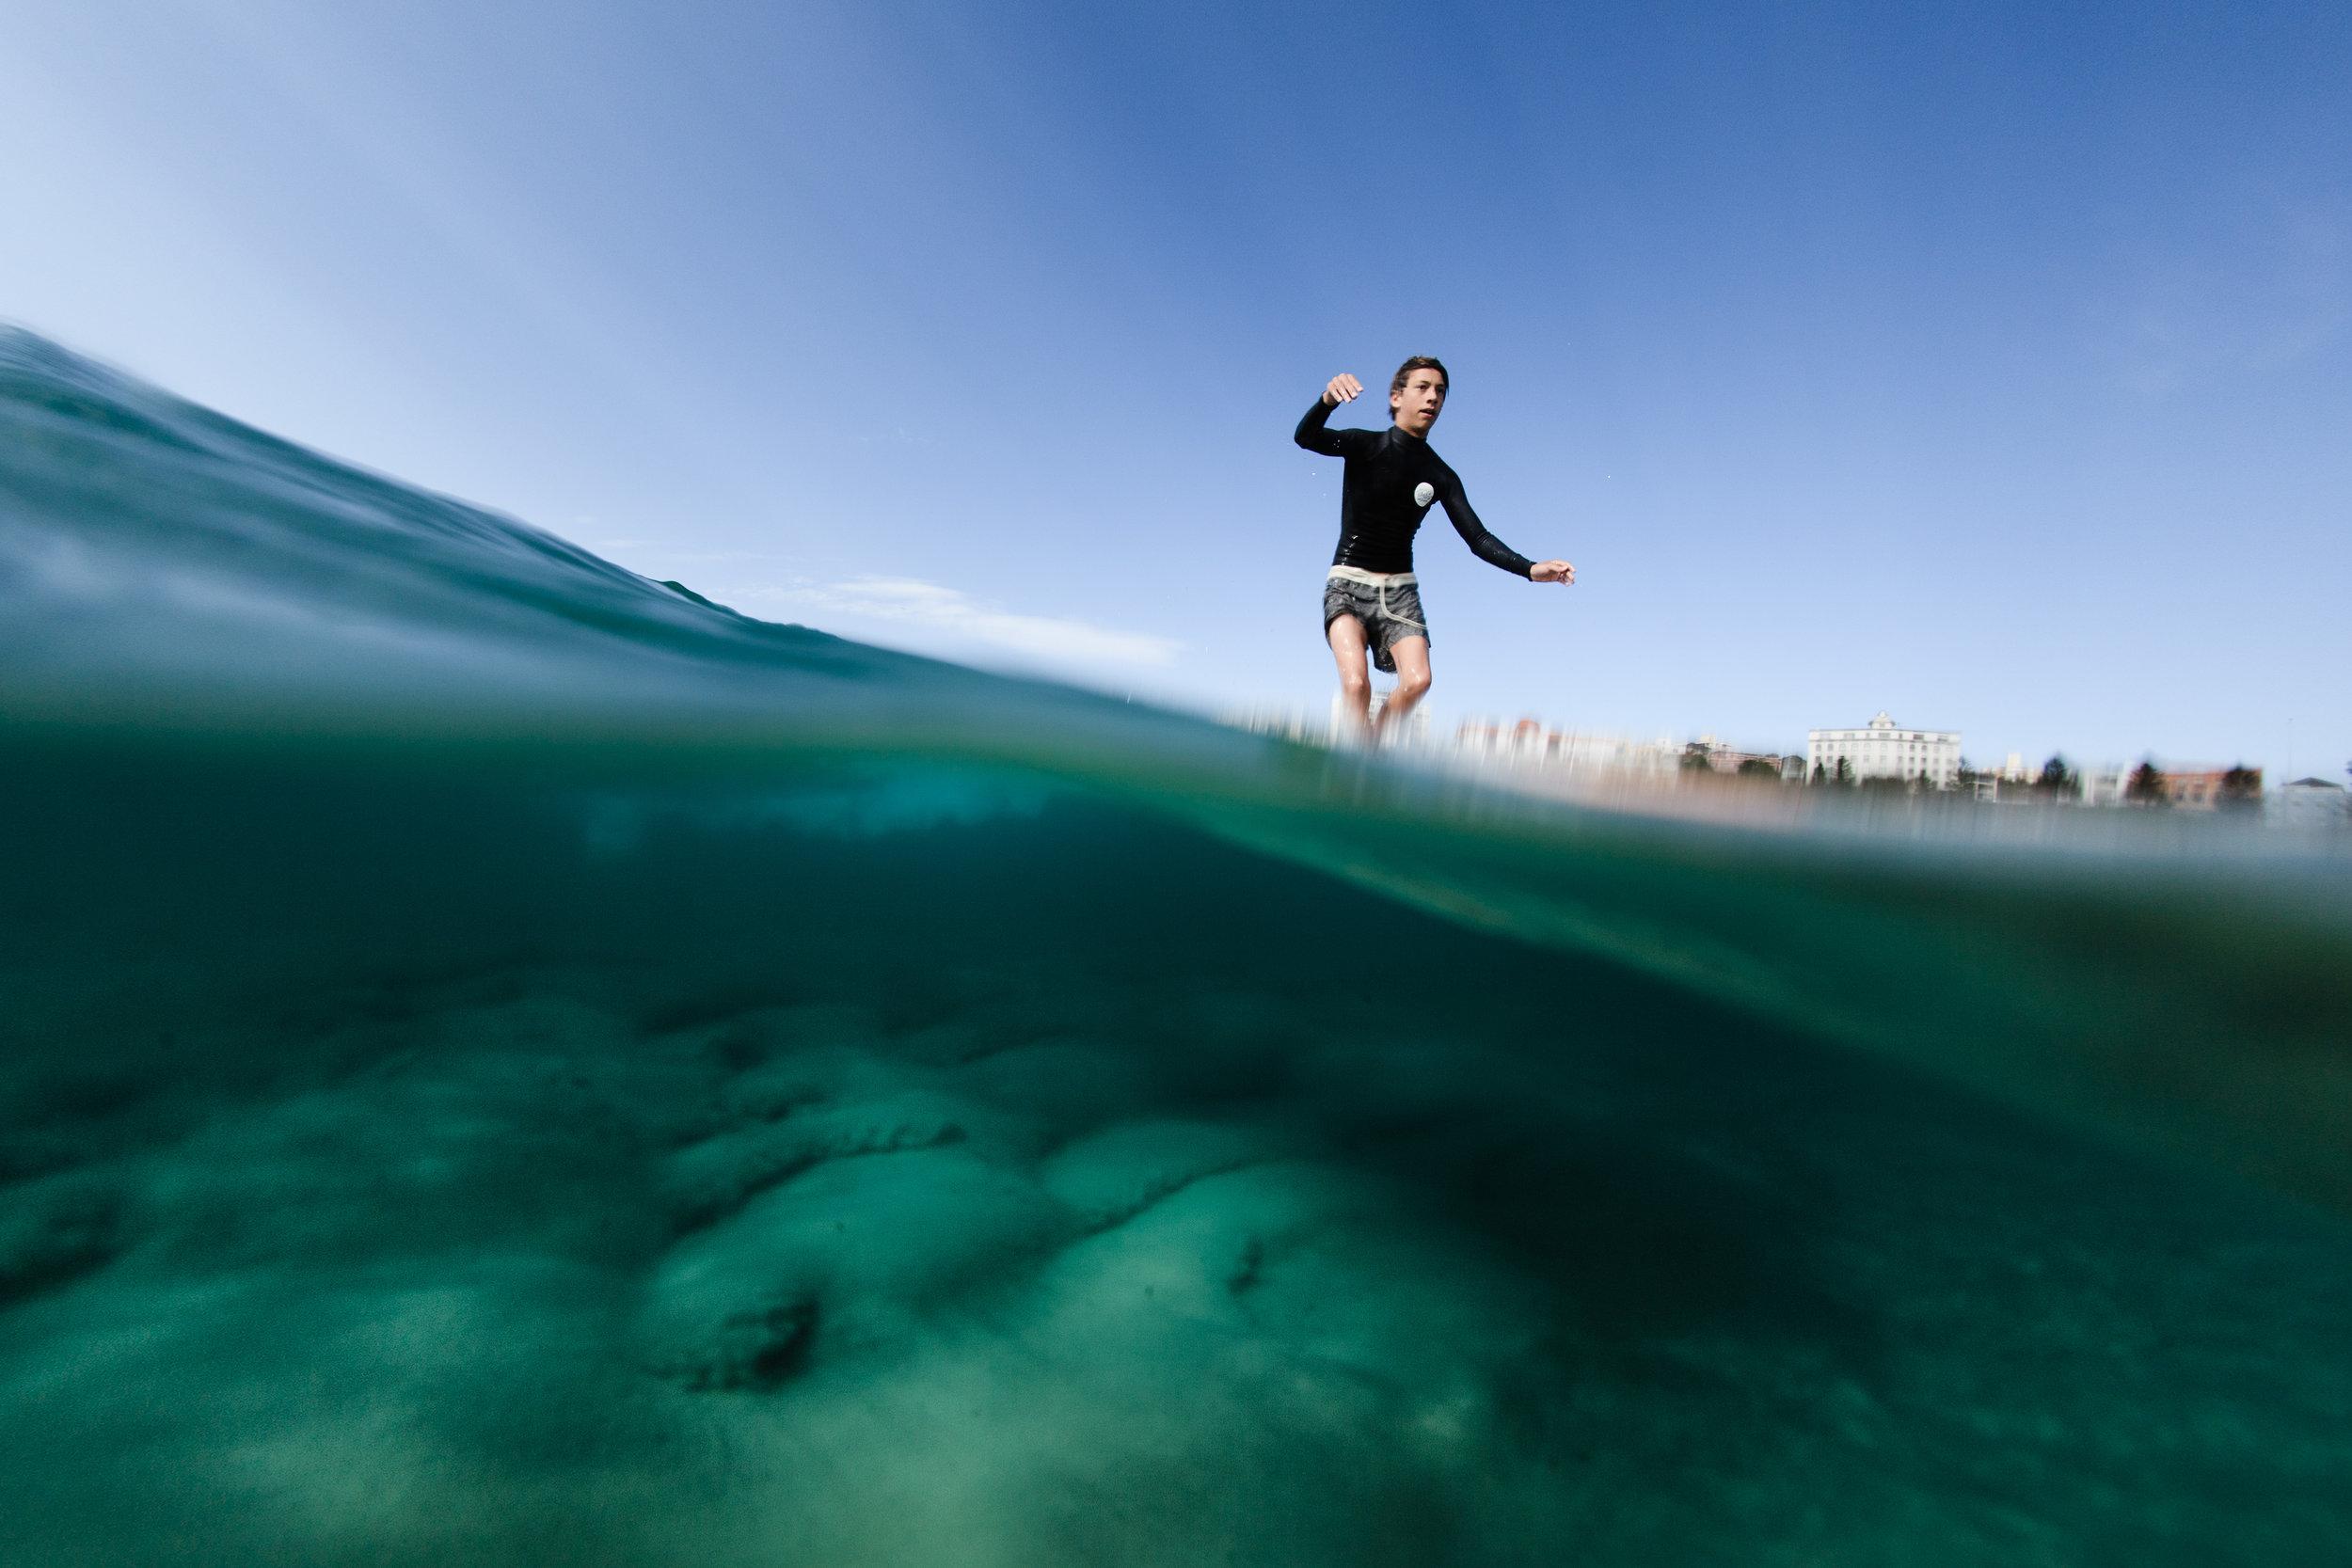 surf (16 of 25).jpg